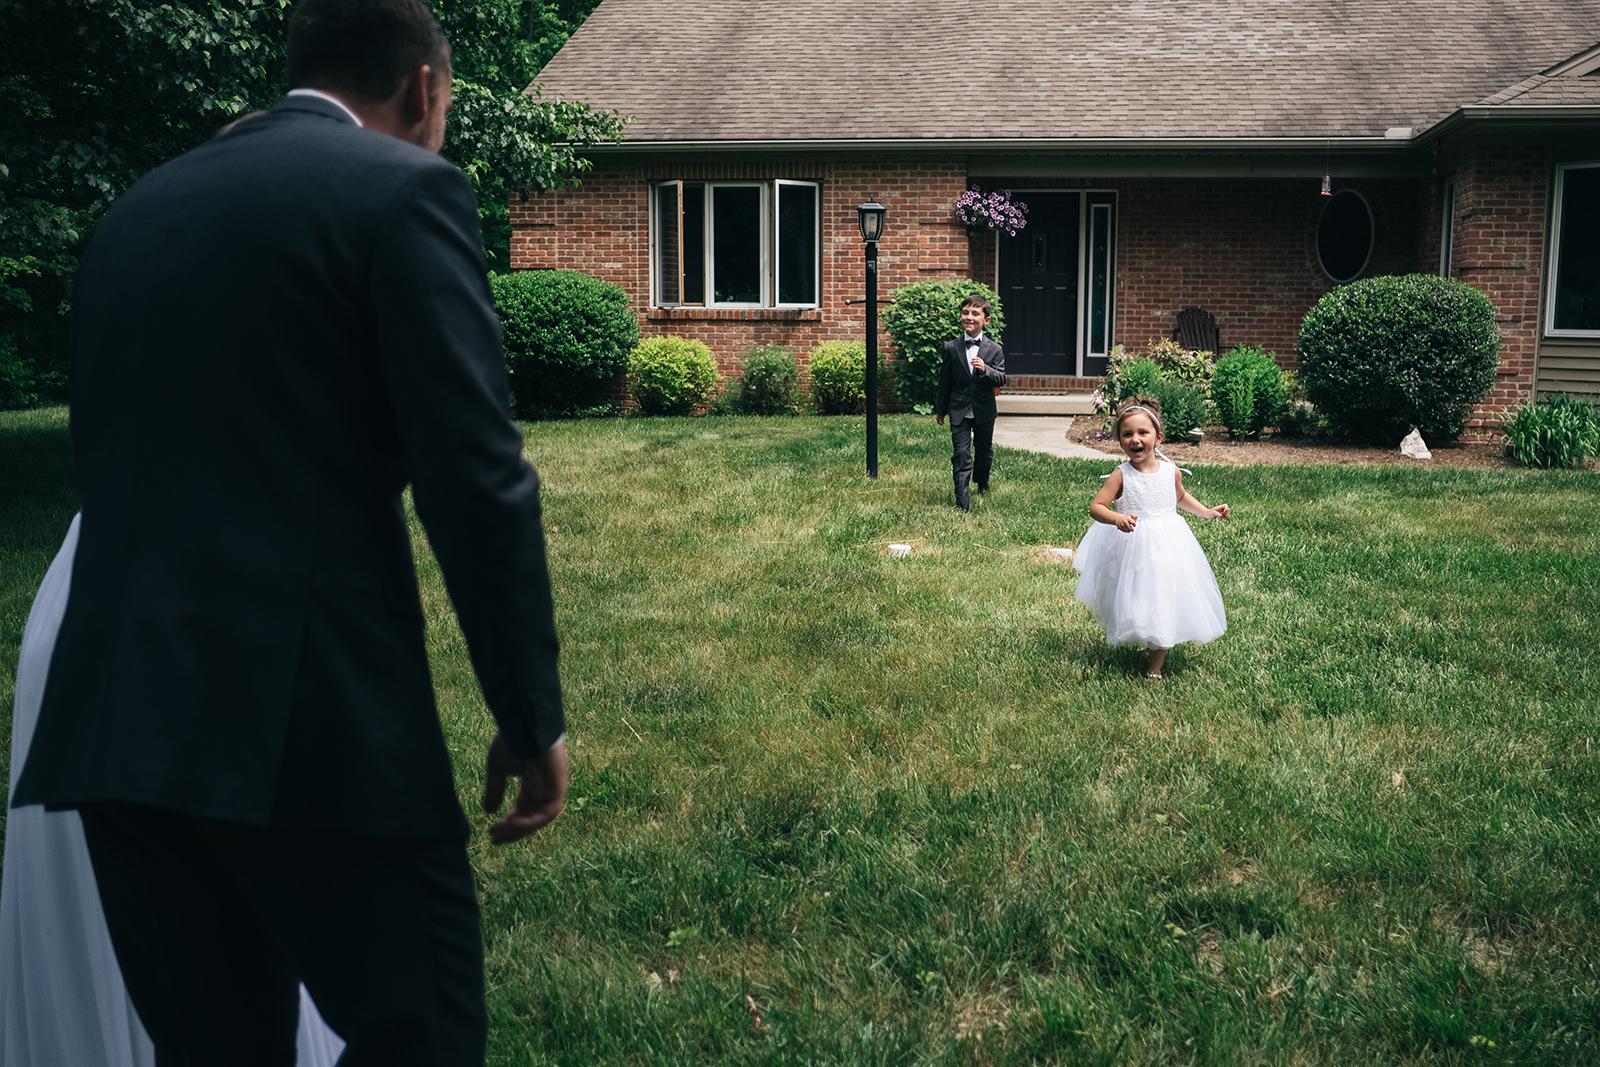 Intimate_Wedding_Photography_in_Toledo_Ohio.jpg